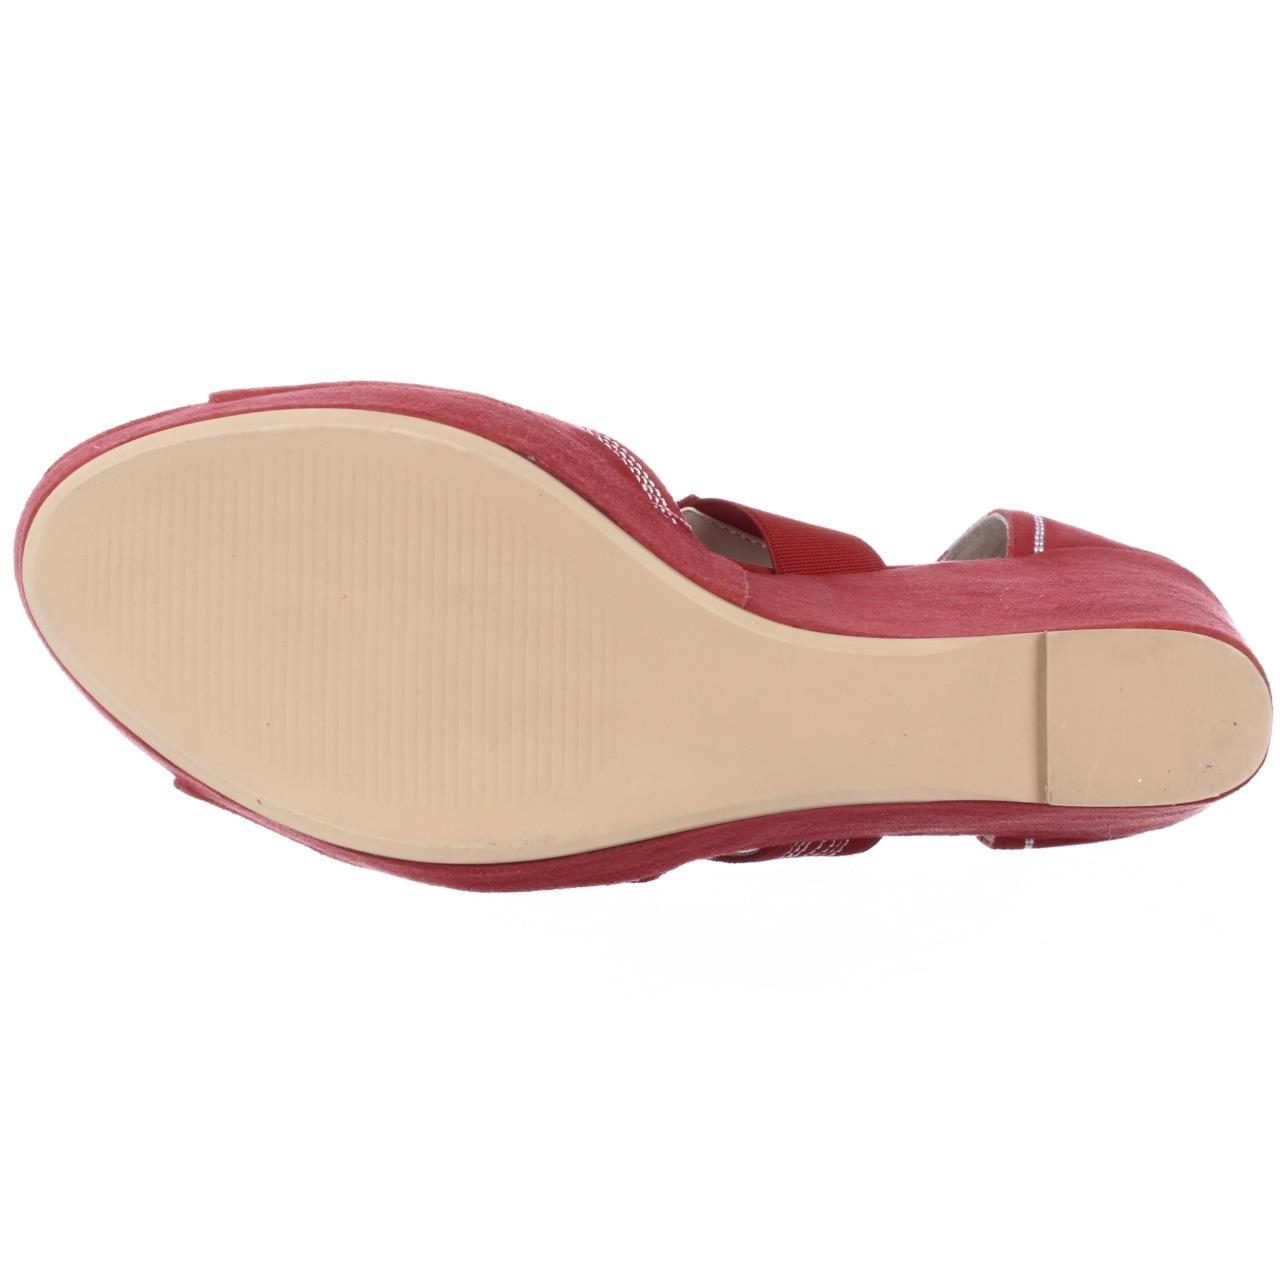 e02630ab03d Amazon.com  June Ambrose 408346 Embroidered Wedge Platform Sandals - Red